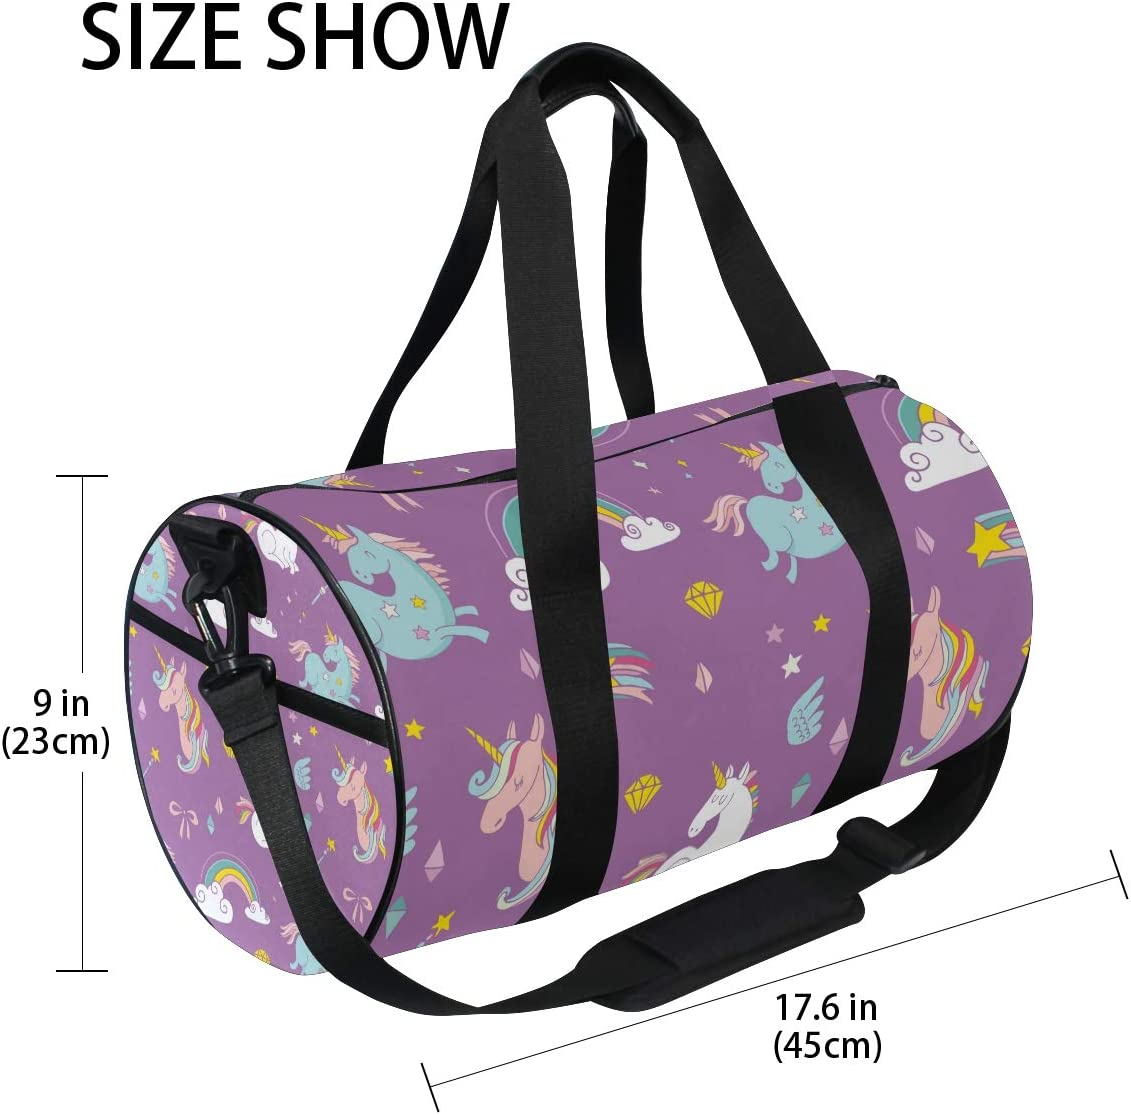 MALPLENA Magic Unicorns Drum gym duffel bag women Travel Bag